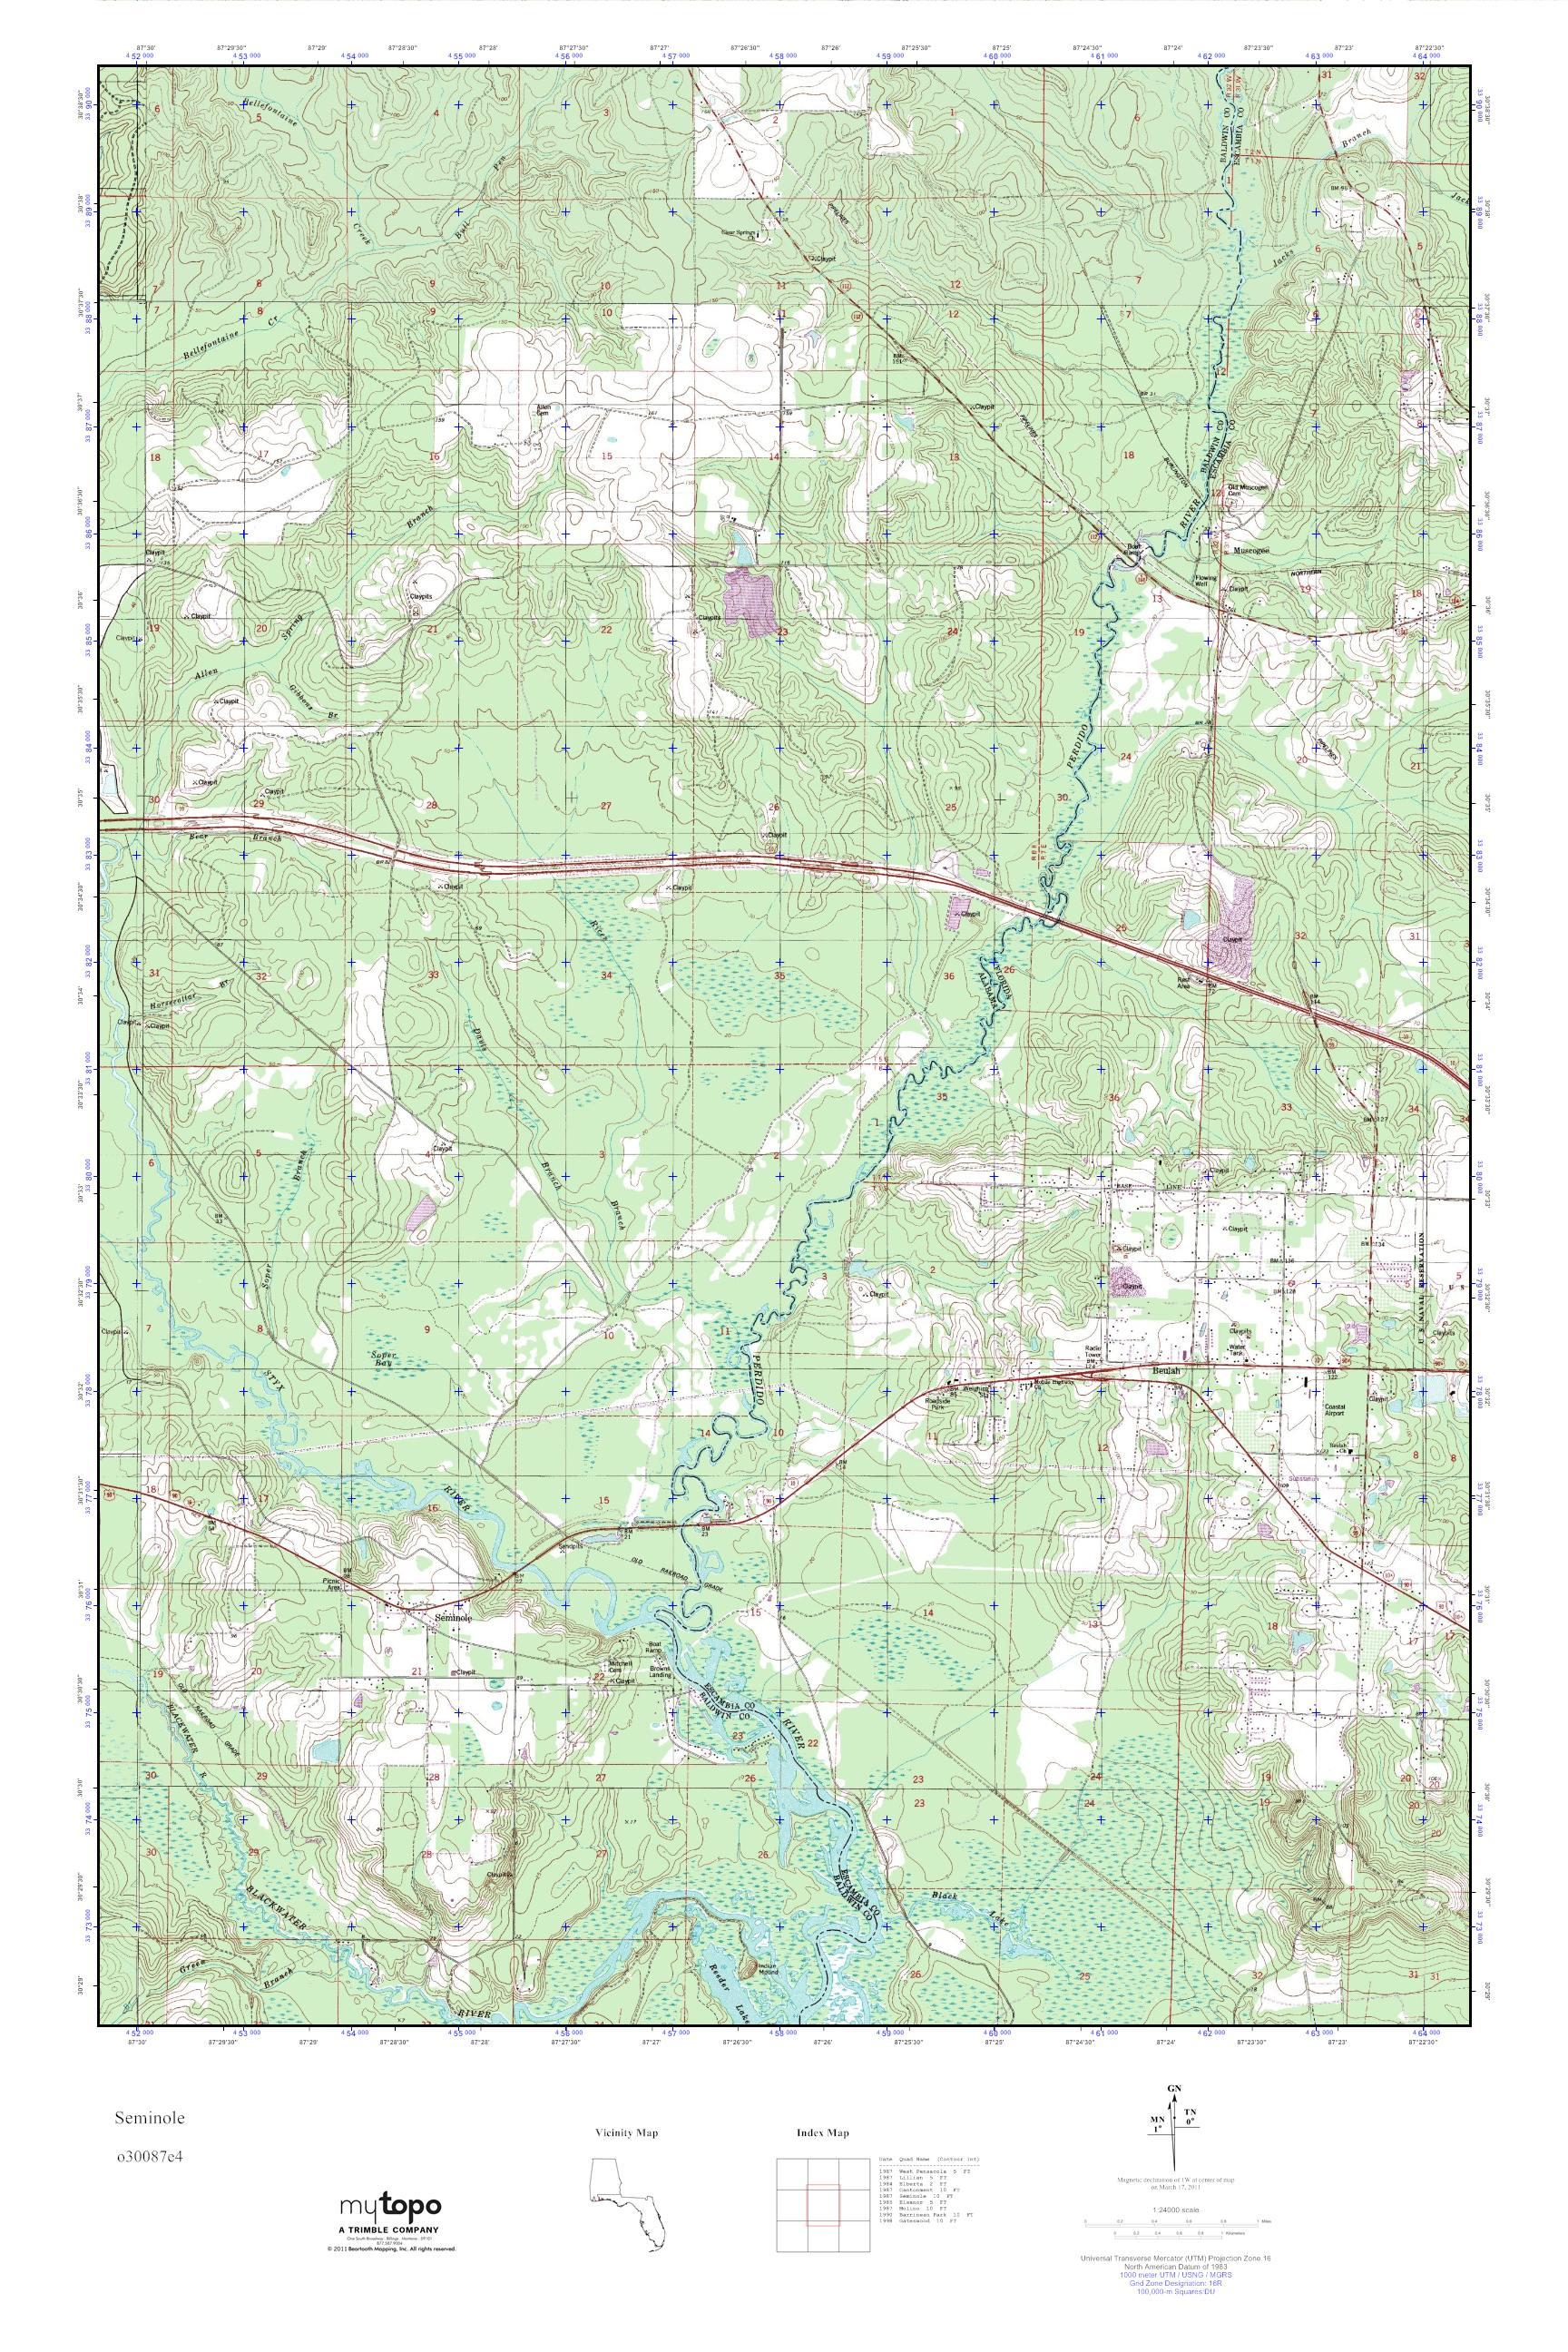 Seminole Florida Map.Mytopo Seminole Florida Usgs Quad Topo Map